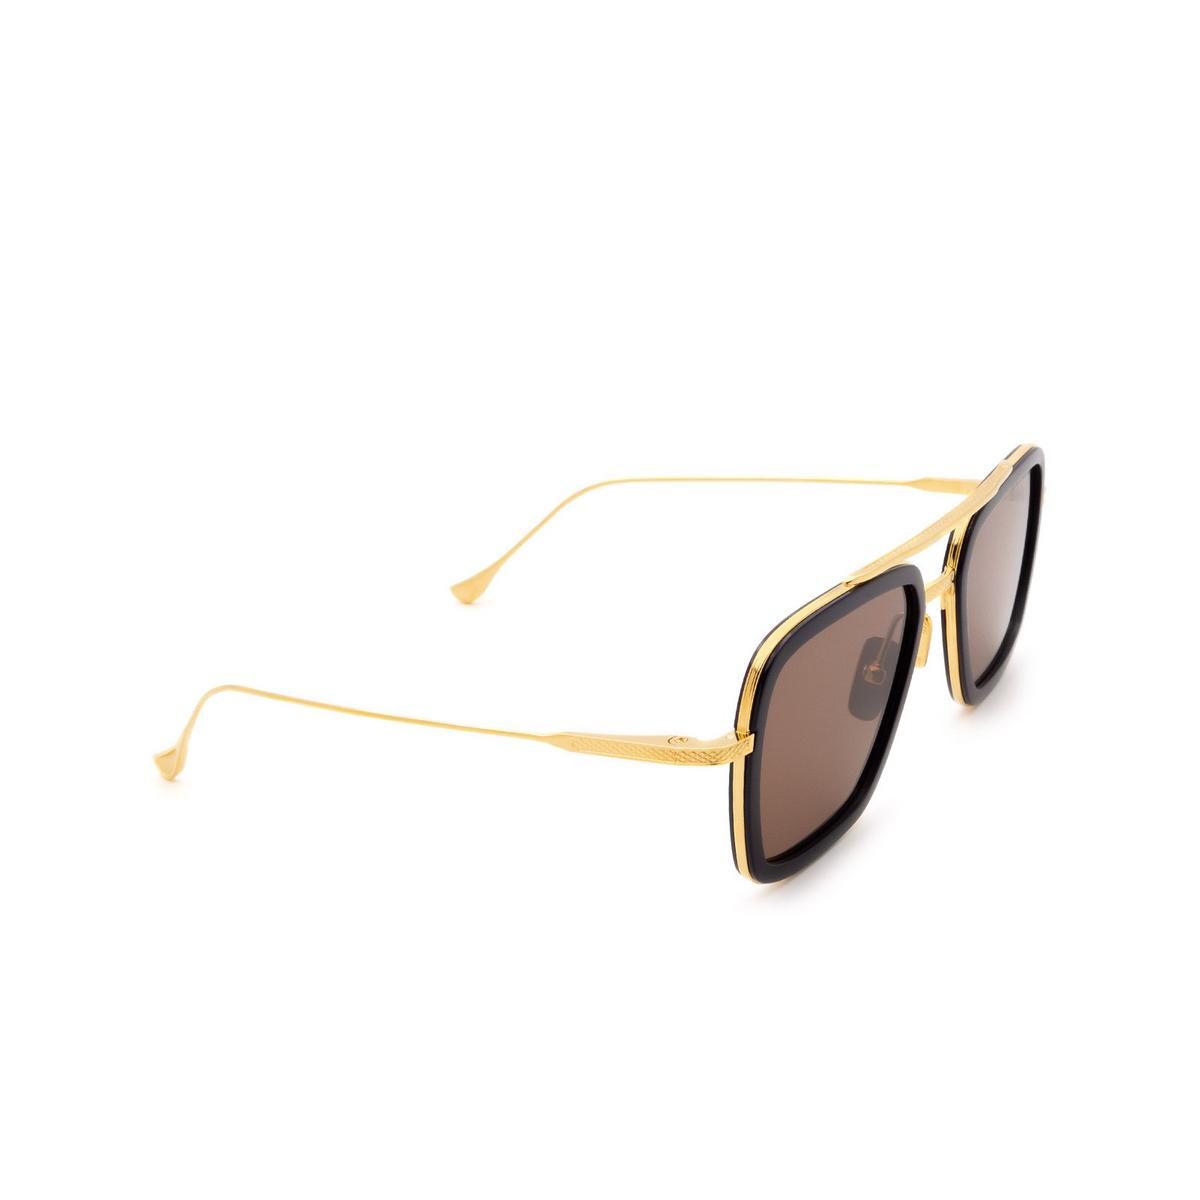 Dita® Aviator Sunglasses: Flight.006 7806-D color Navy & Gold Nvy-gld.